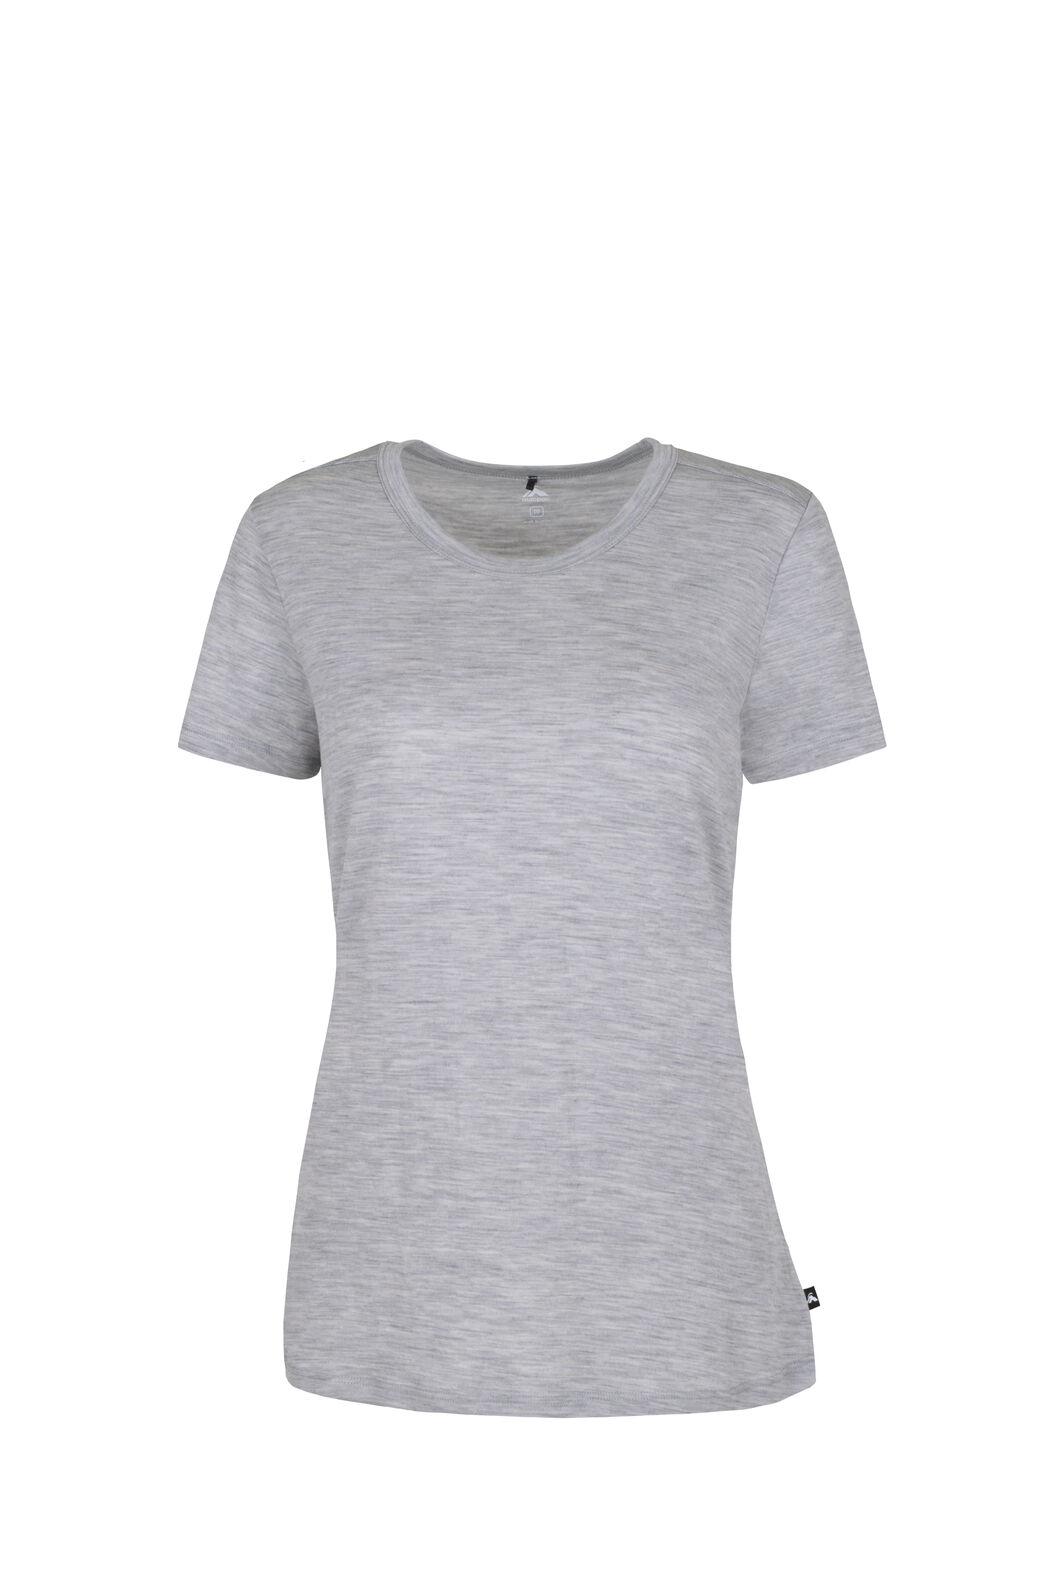 Macpac Lyellette 180 Merino Short Sleeve Crew - Women's, Grey Marle, hi-res